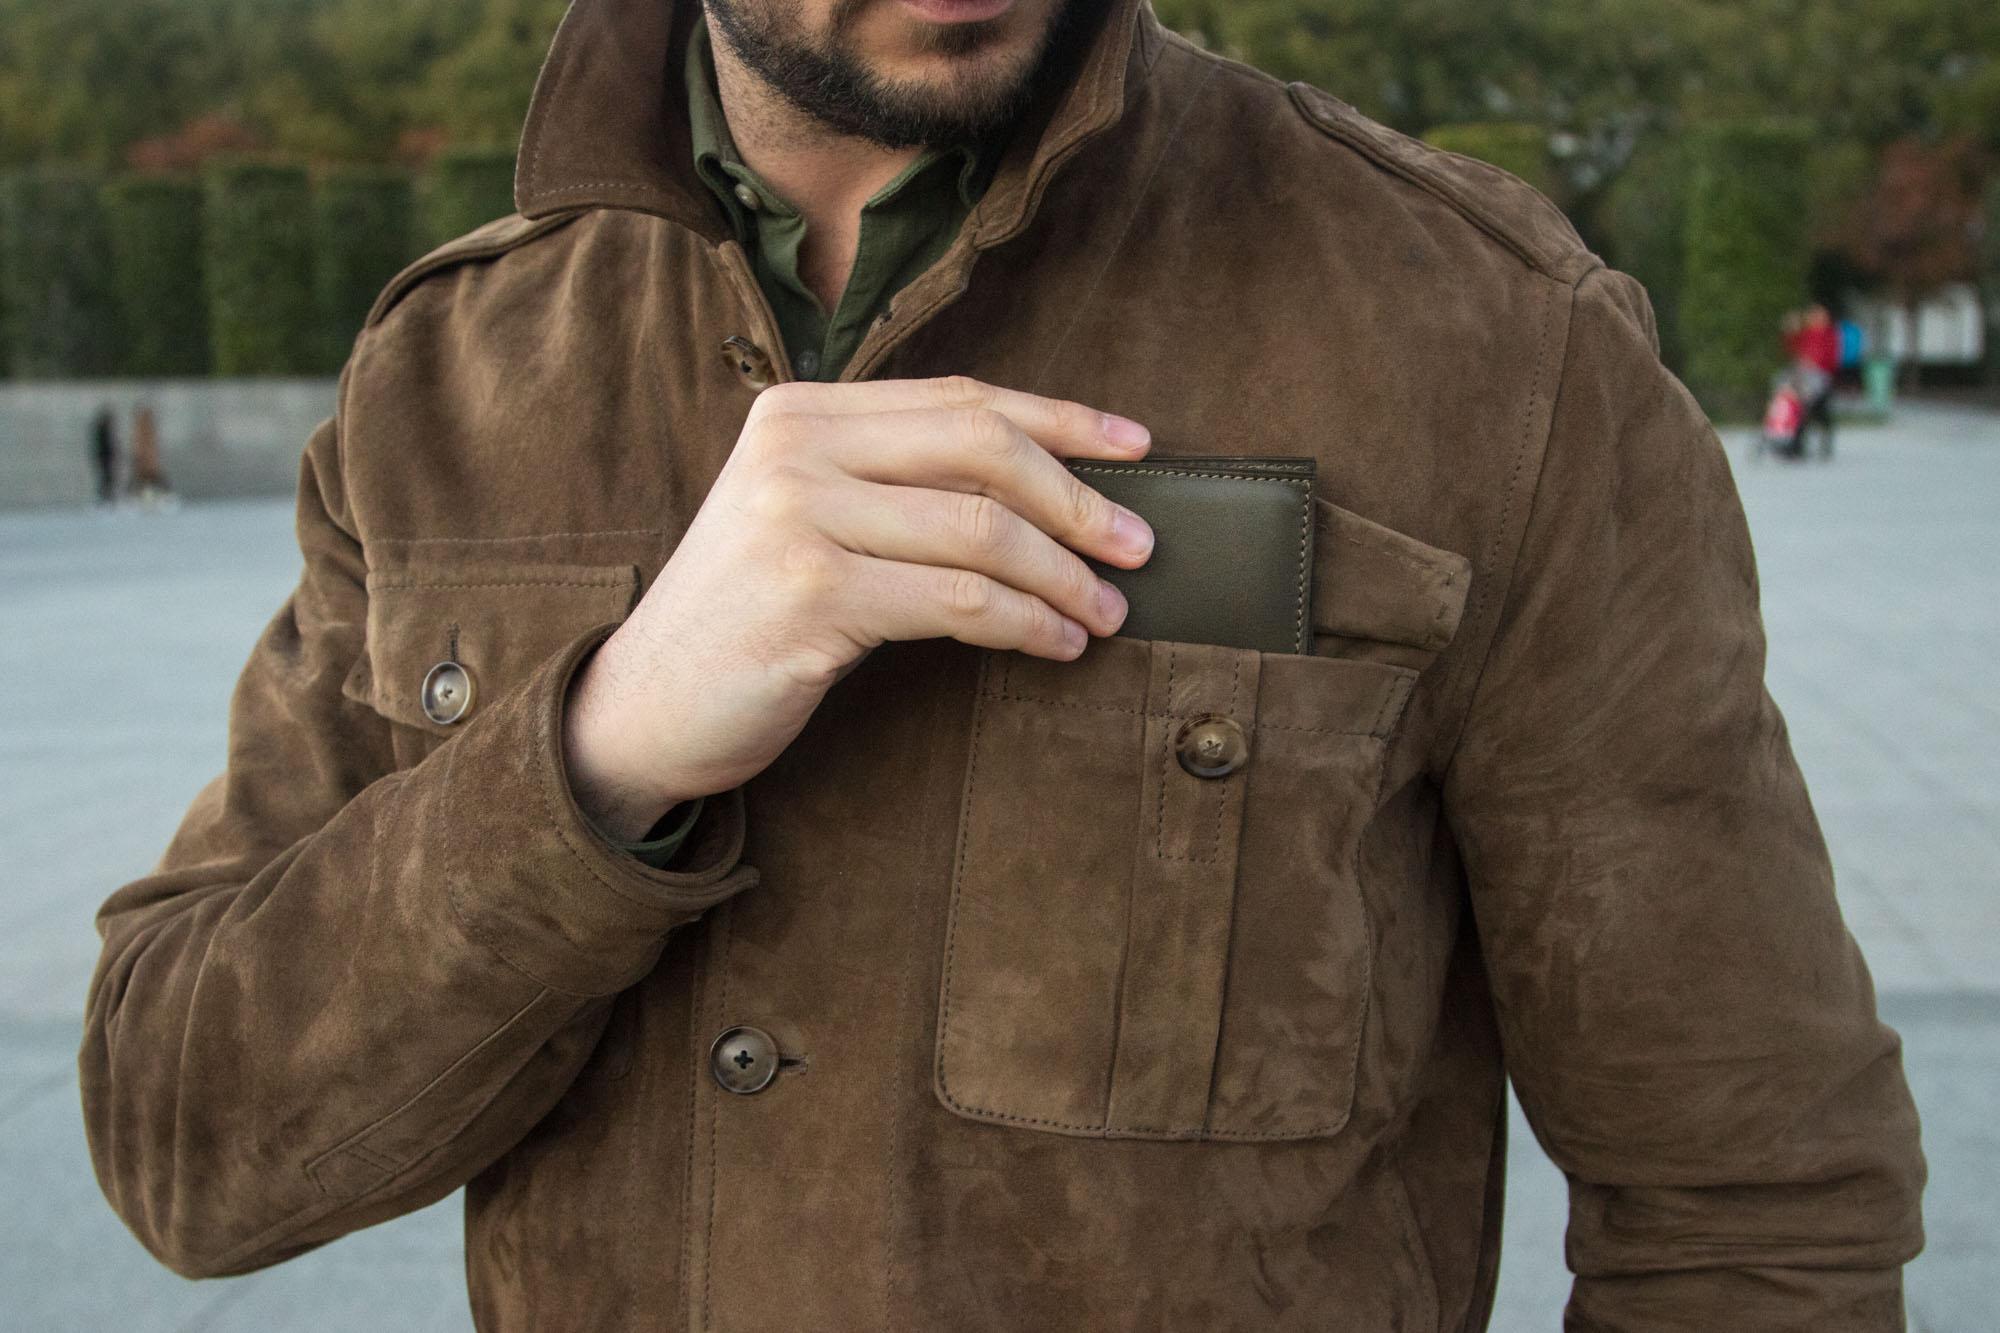 Joseph Bonnie - Buddy : Portefeuille minimaliste en cuir